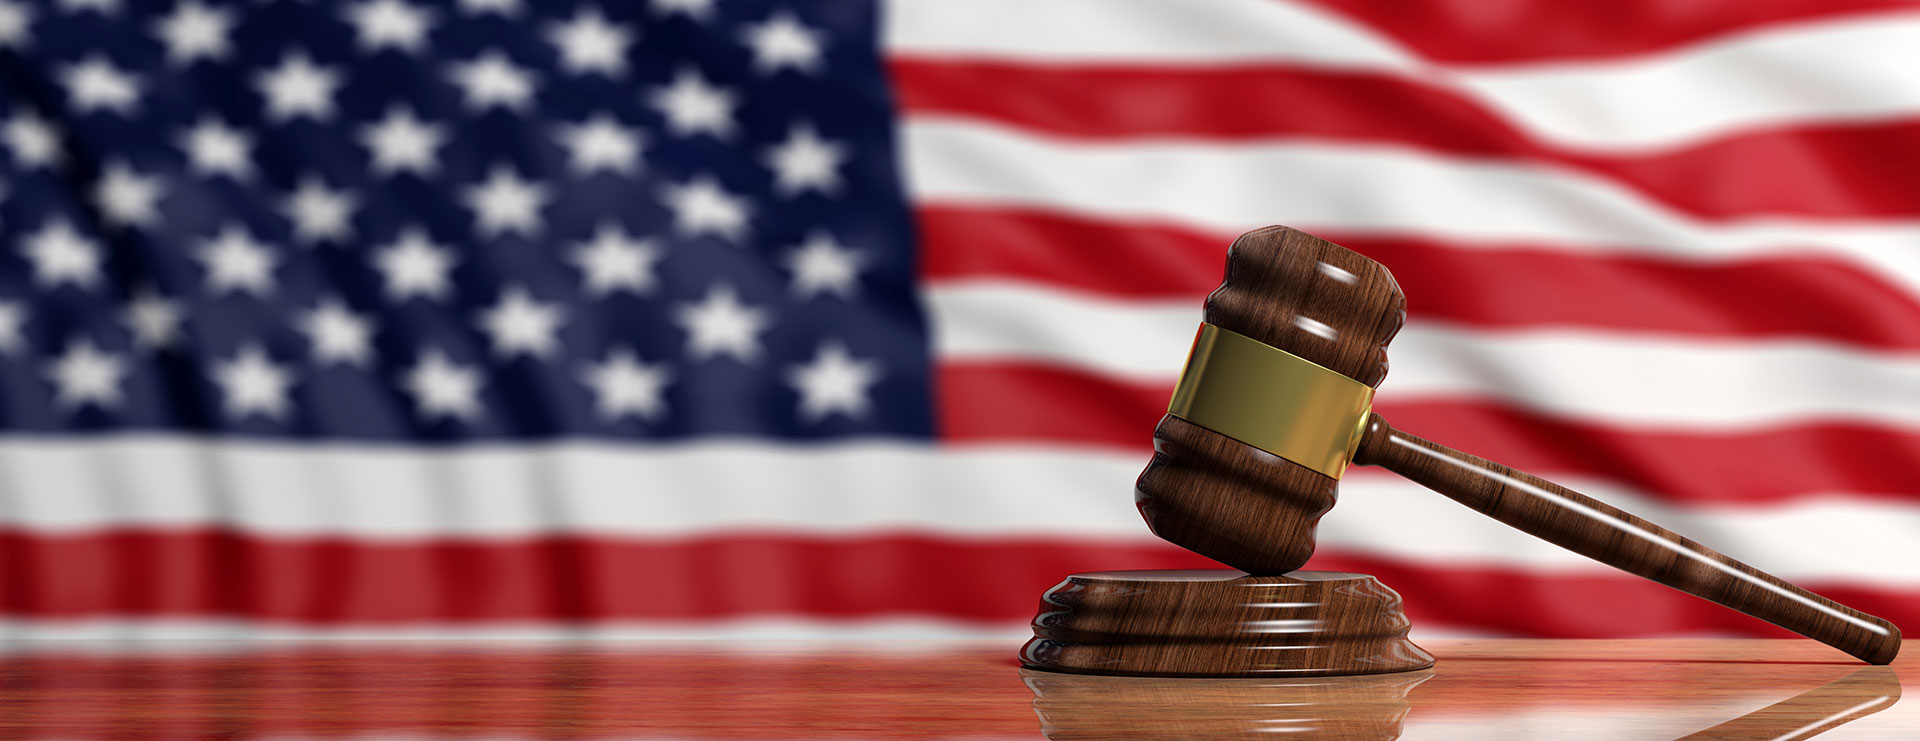 Palm Bay Attorney Gavel USA Flag